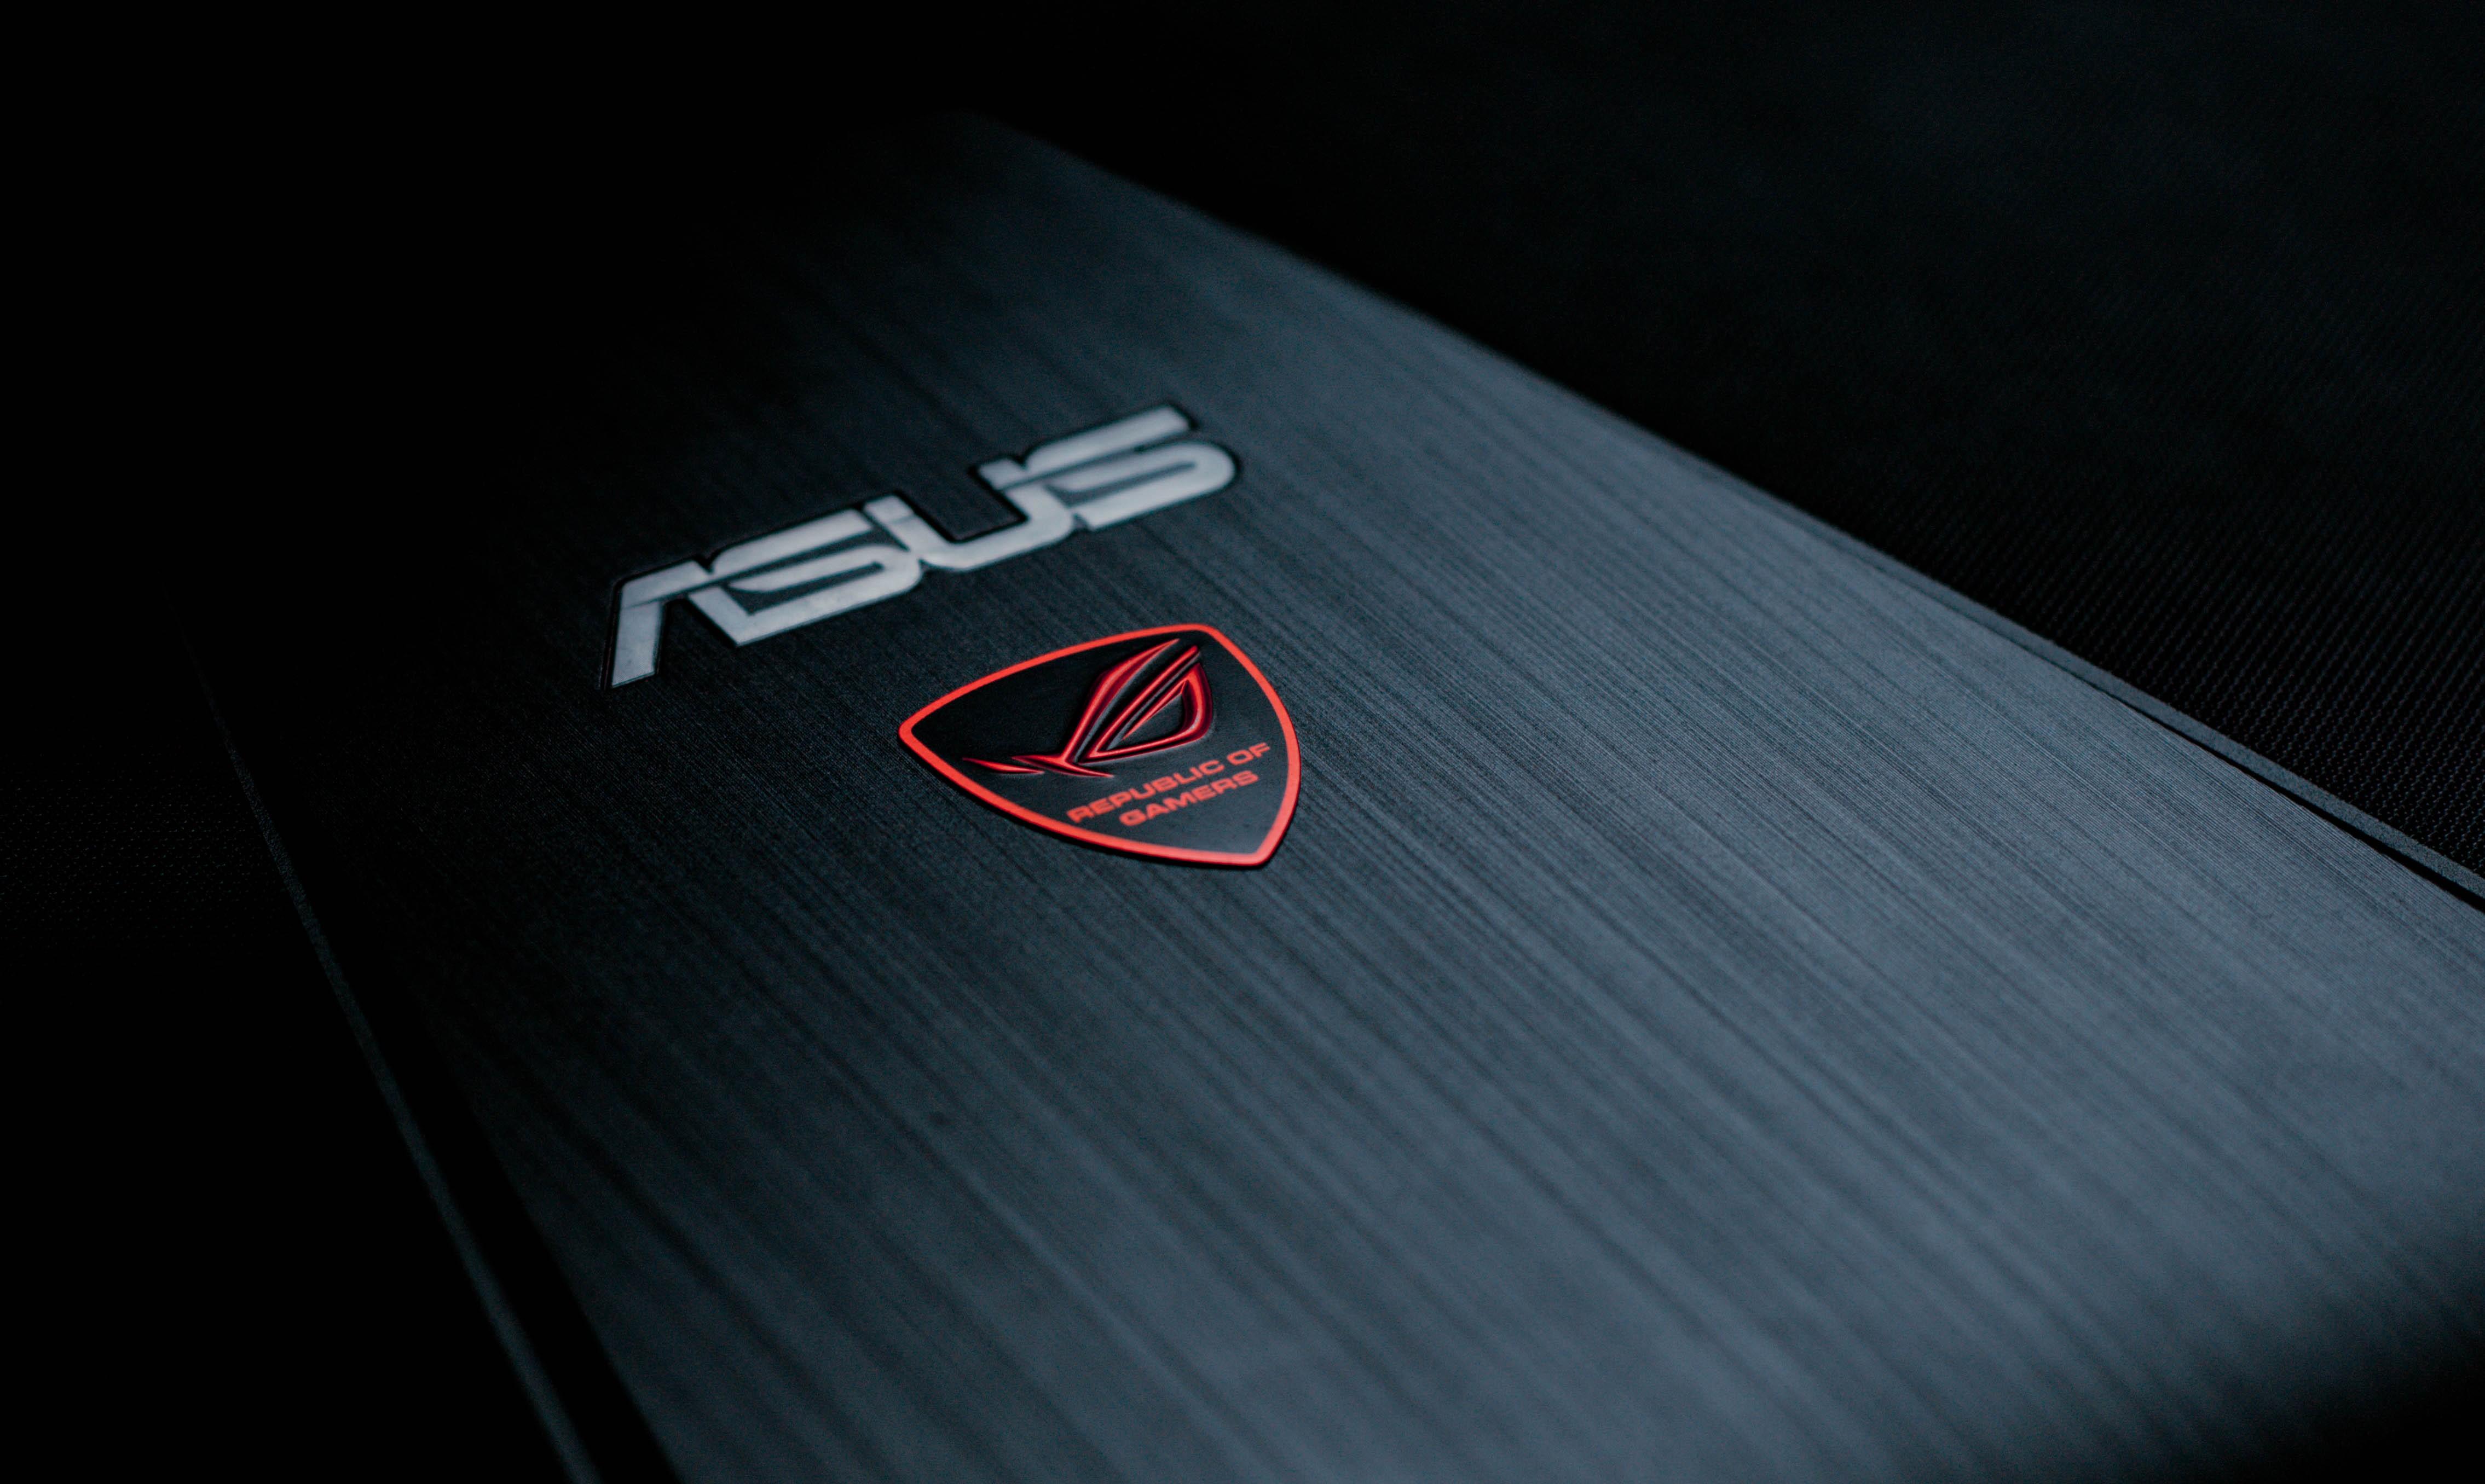 Logo Republic Of Gamers ASUS Brand Screenshot Computer Wallpaper Font